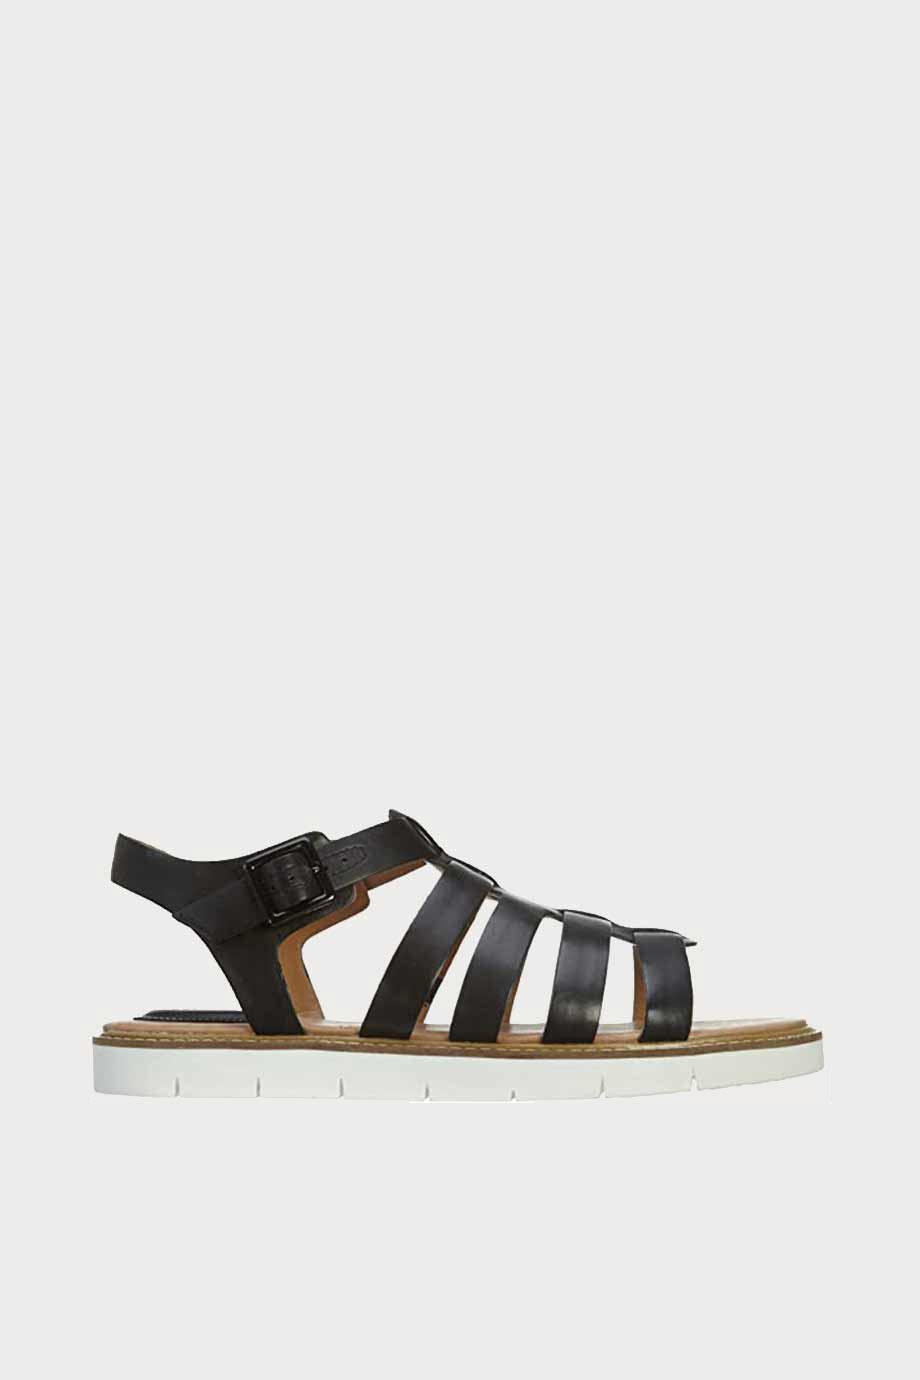 spiridoula metheniti shoes xalkida p Lydie Kona clarks black leather 2 1